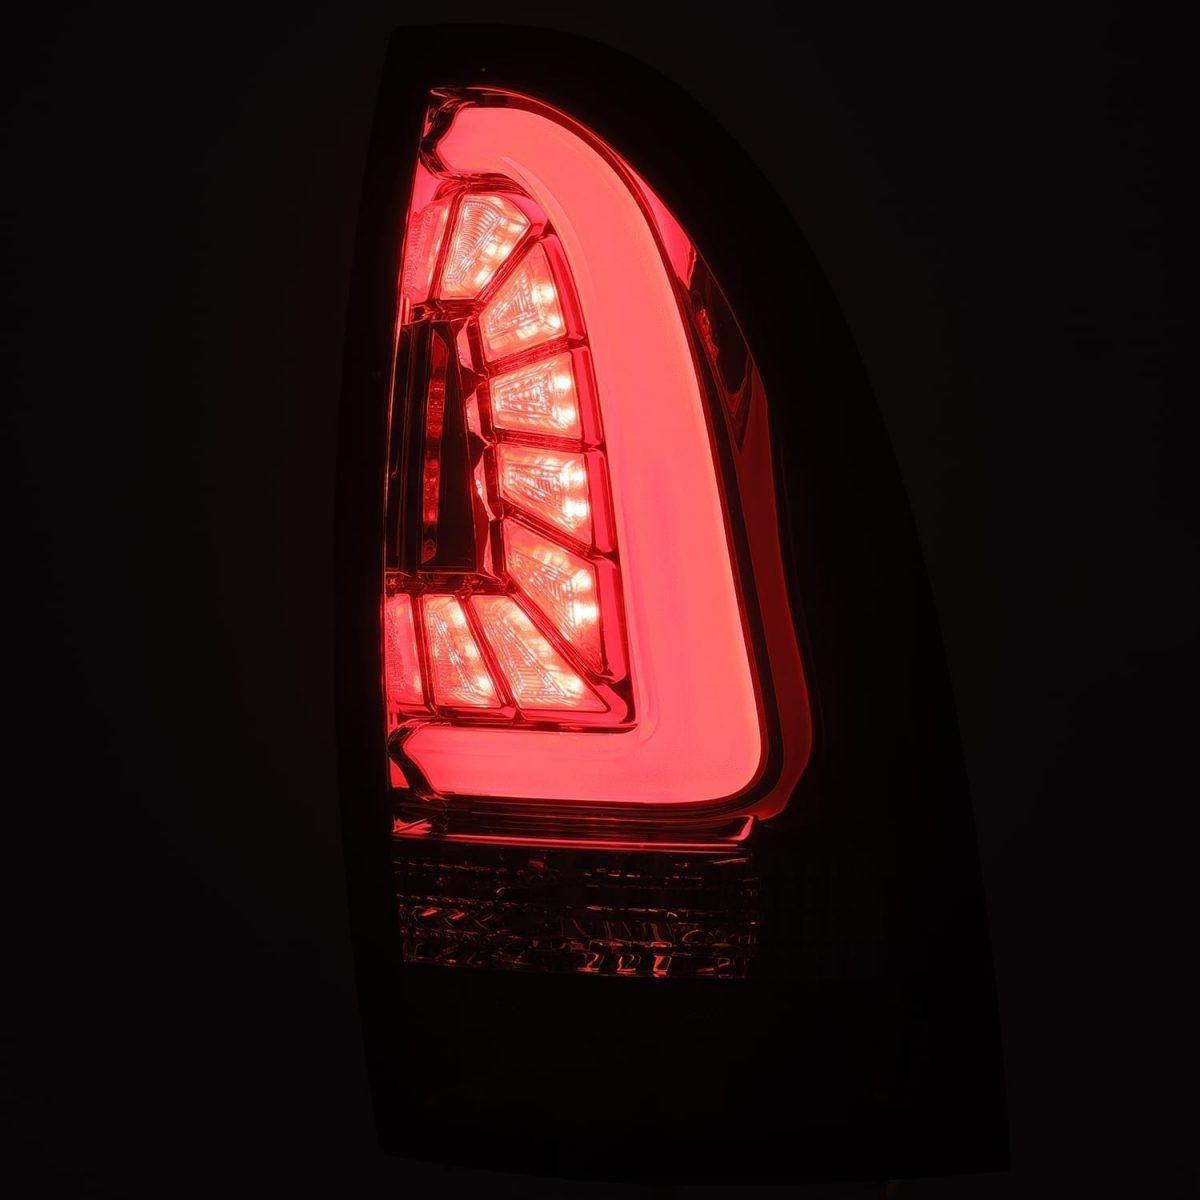 2005 2006 2007 2008 2009 2010 2011 2012 2013 2014 2015 Toyota Tacoma AlphaRex PRO-Series LED Tail Lights